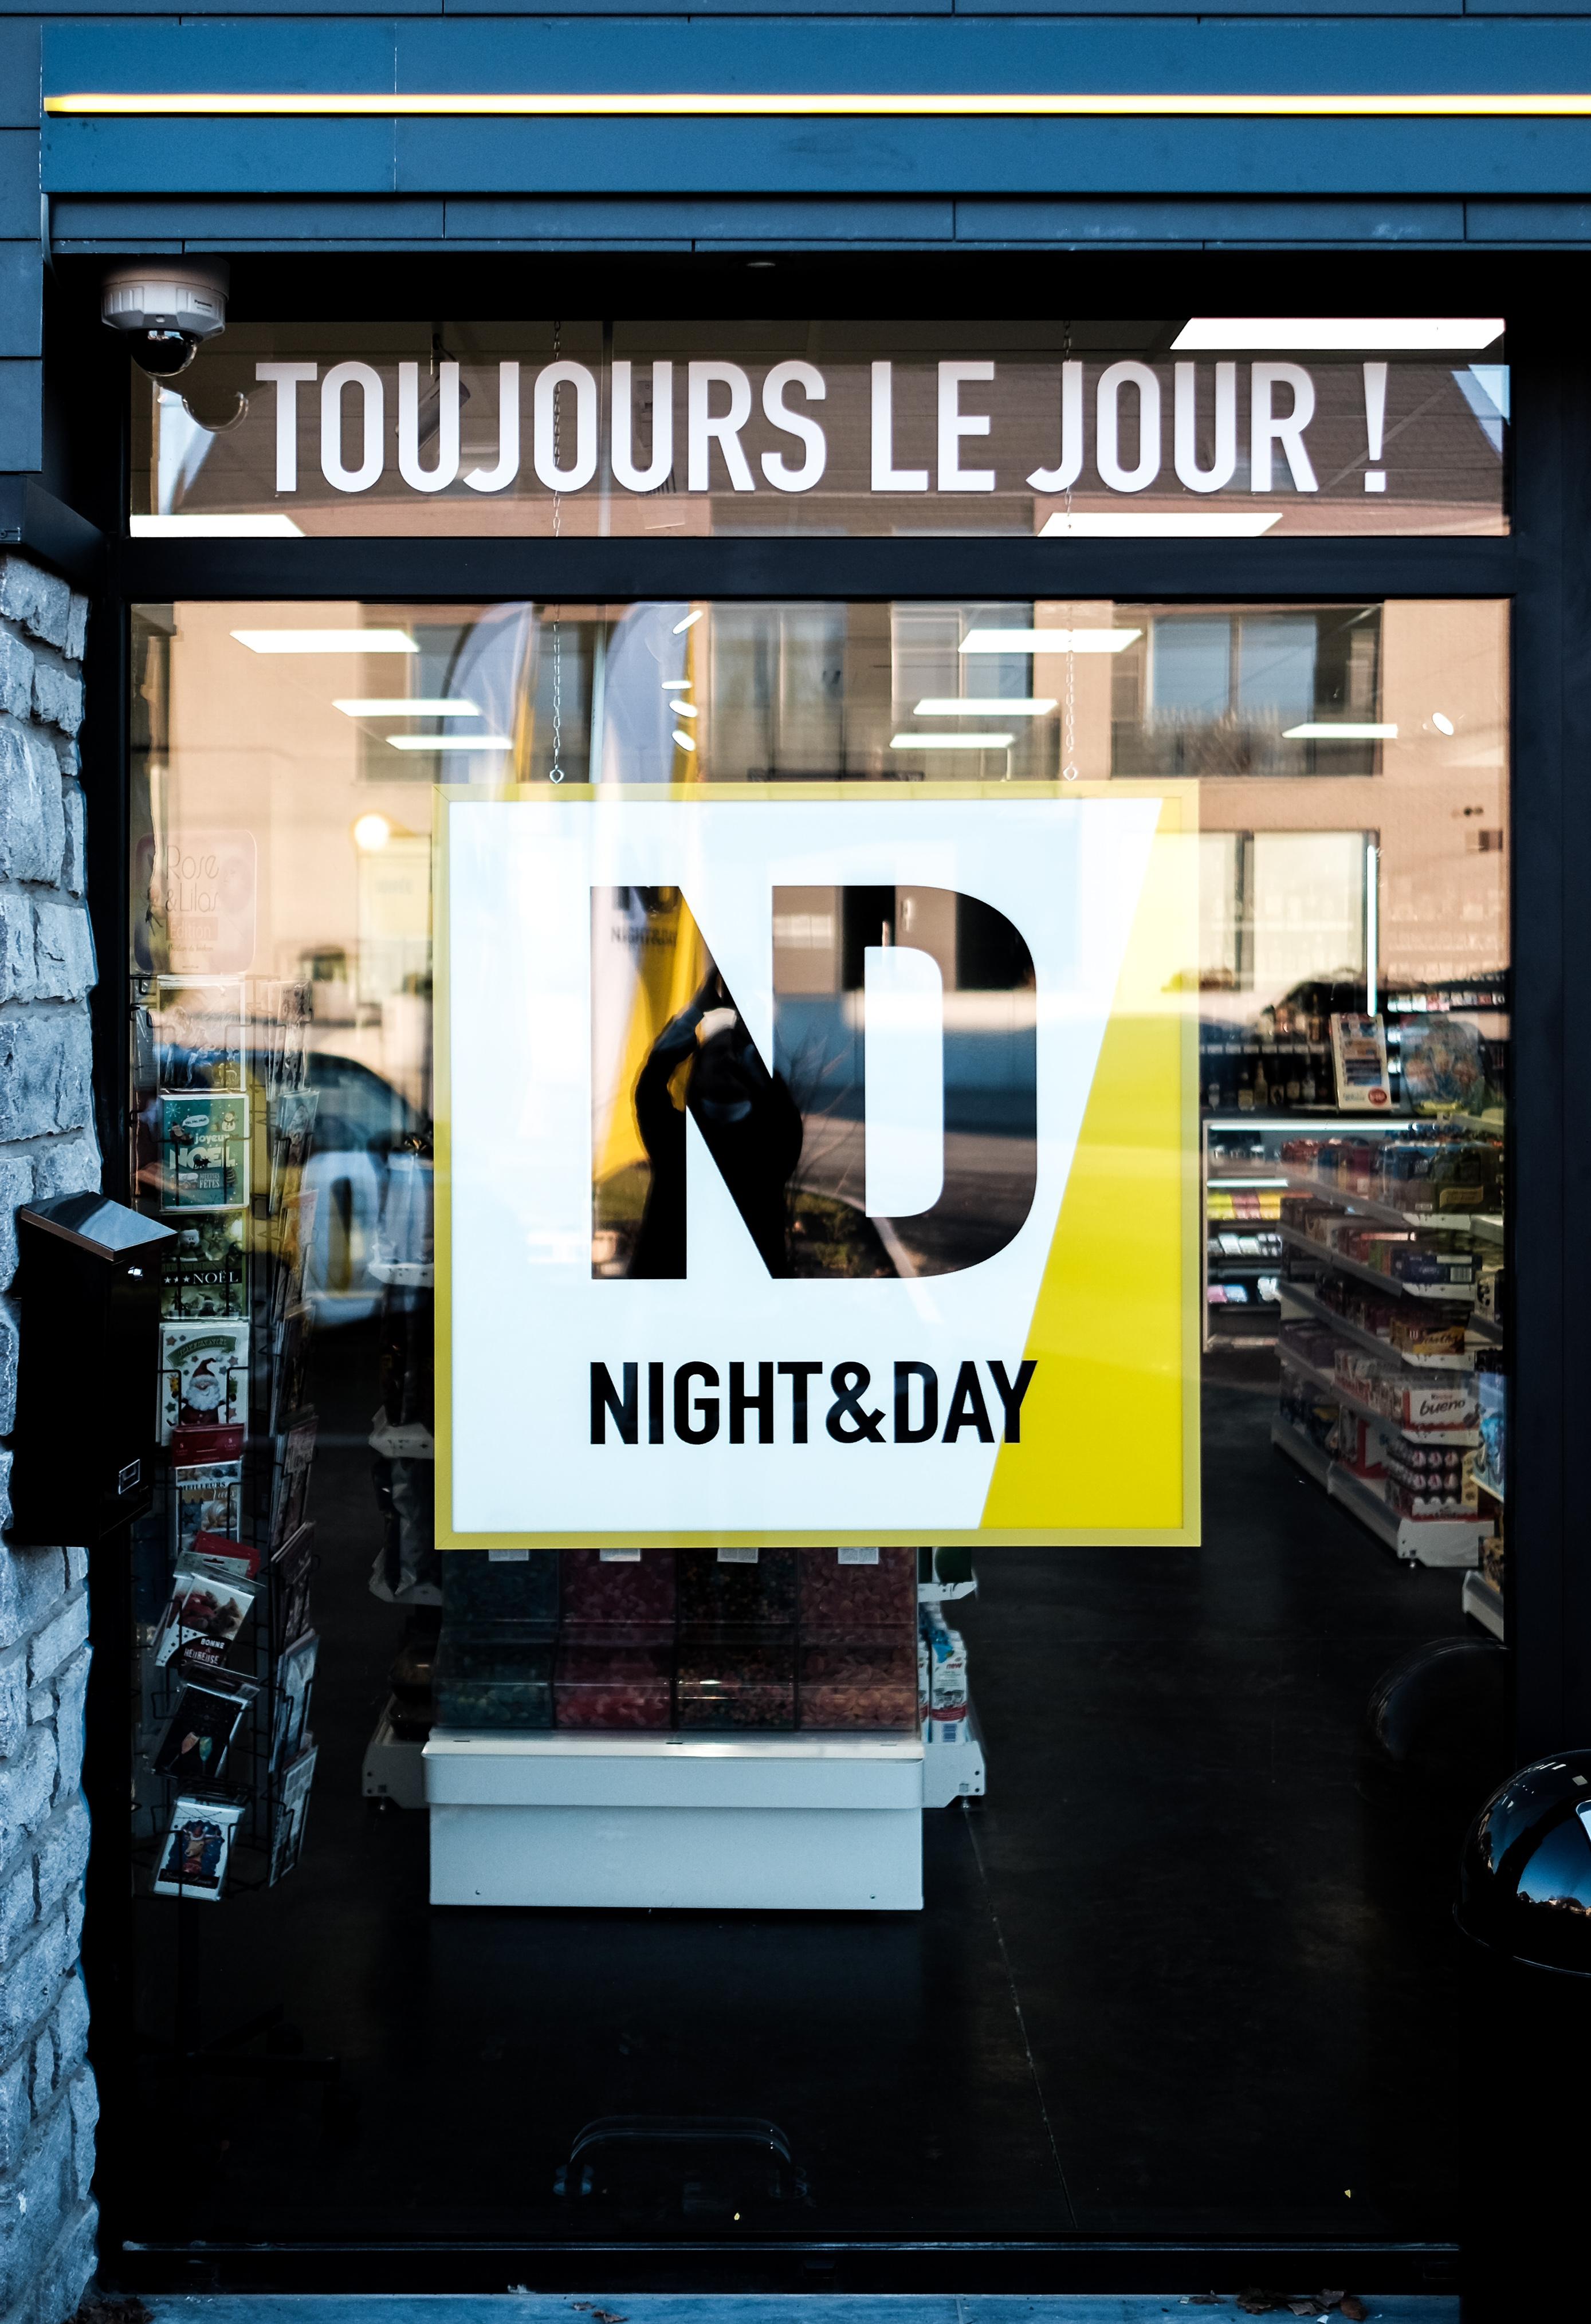 Night & Day – Étude de localisation